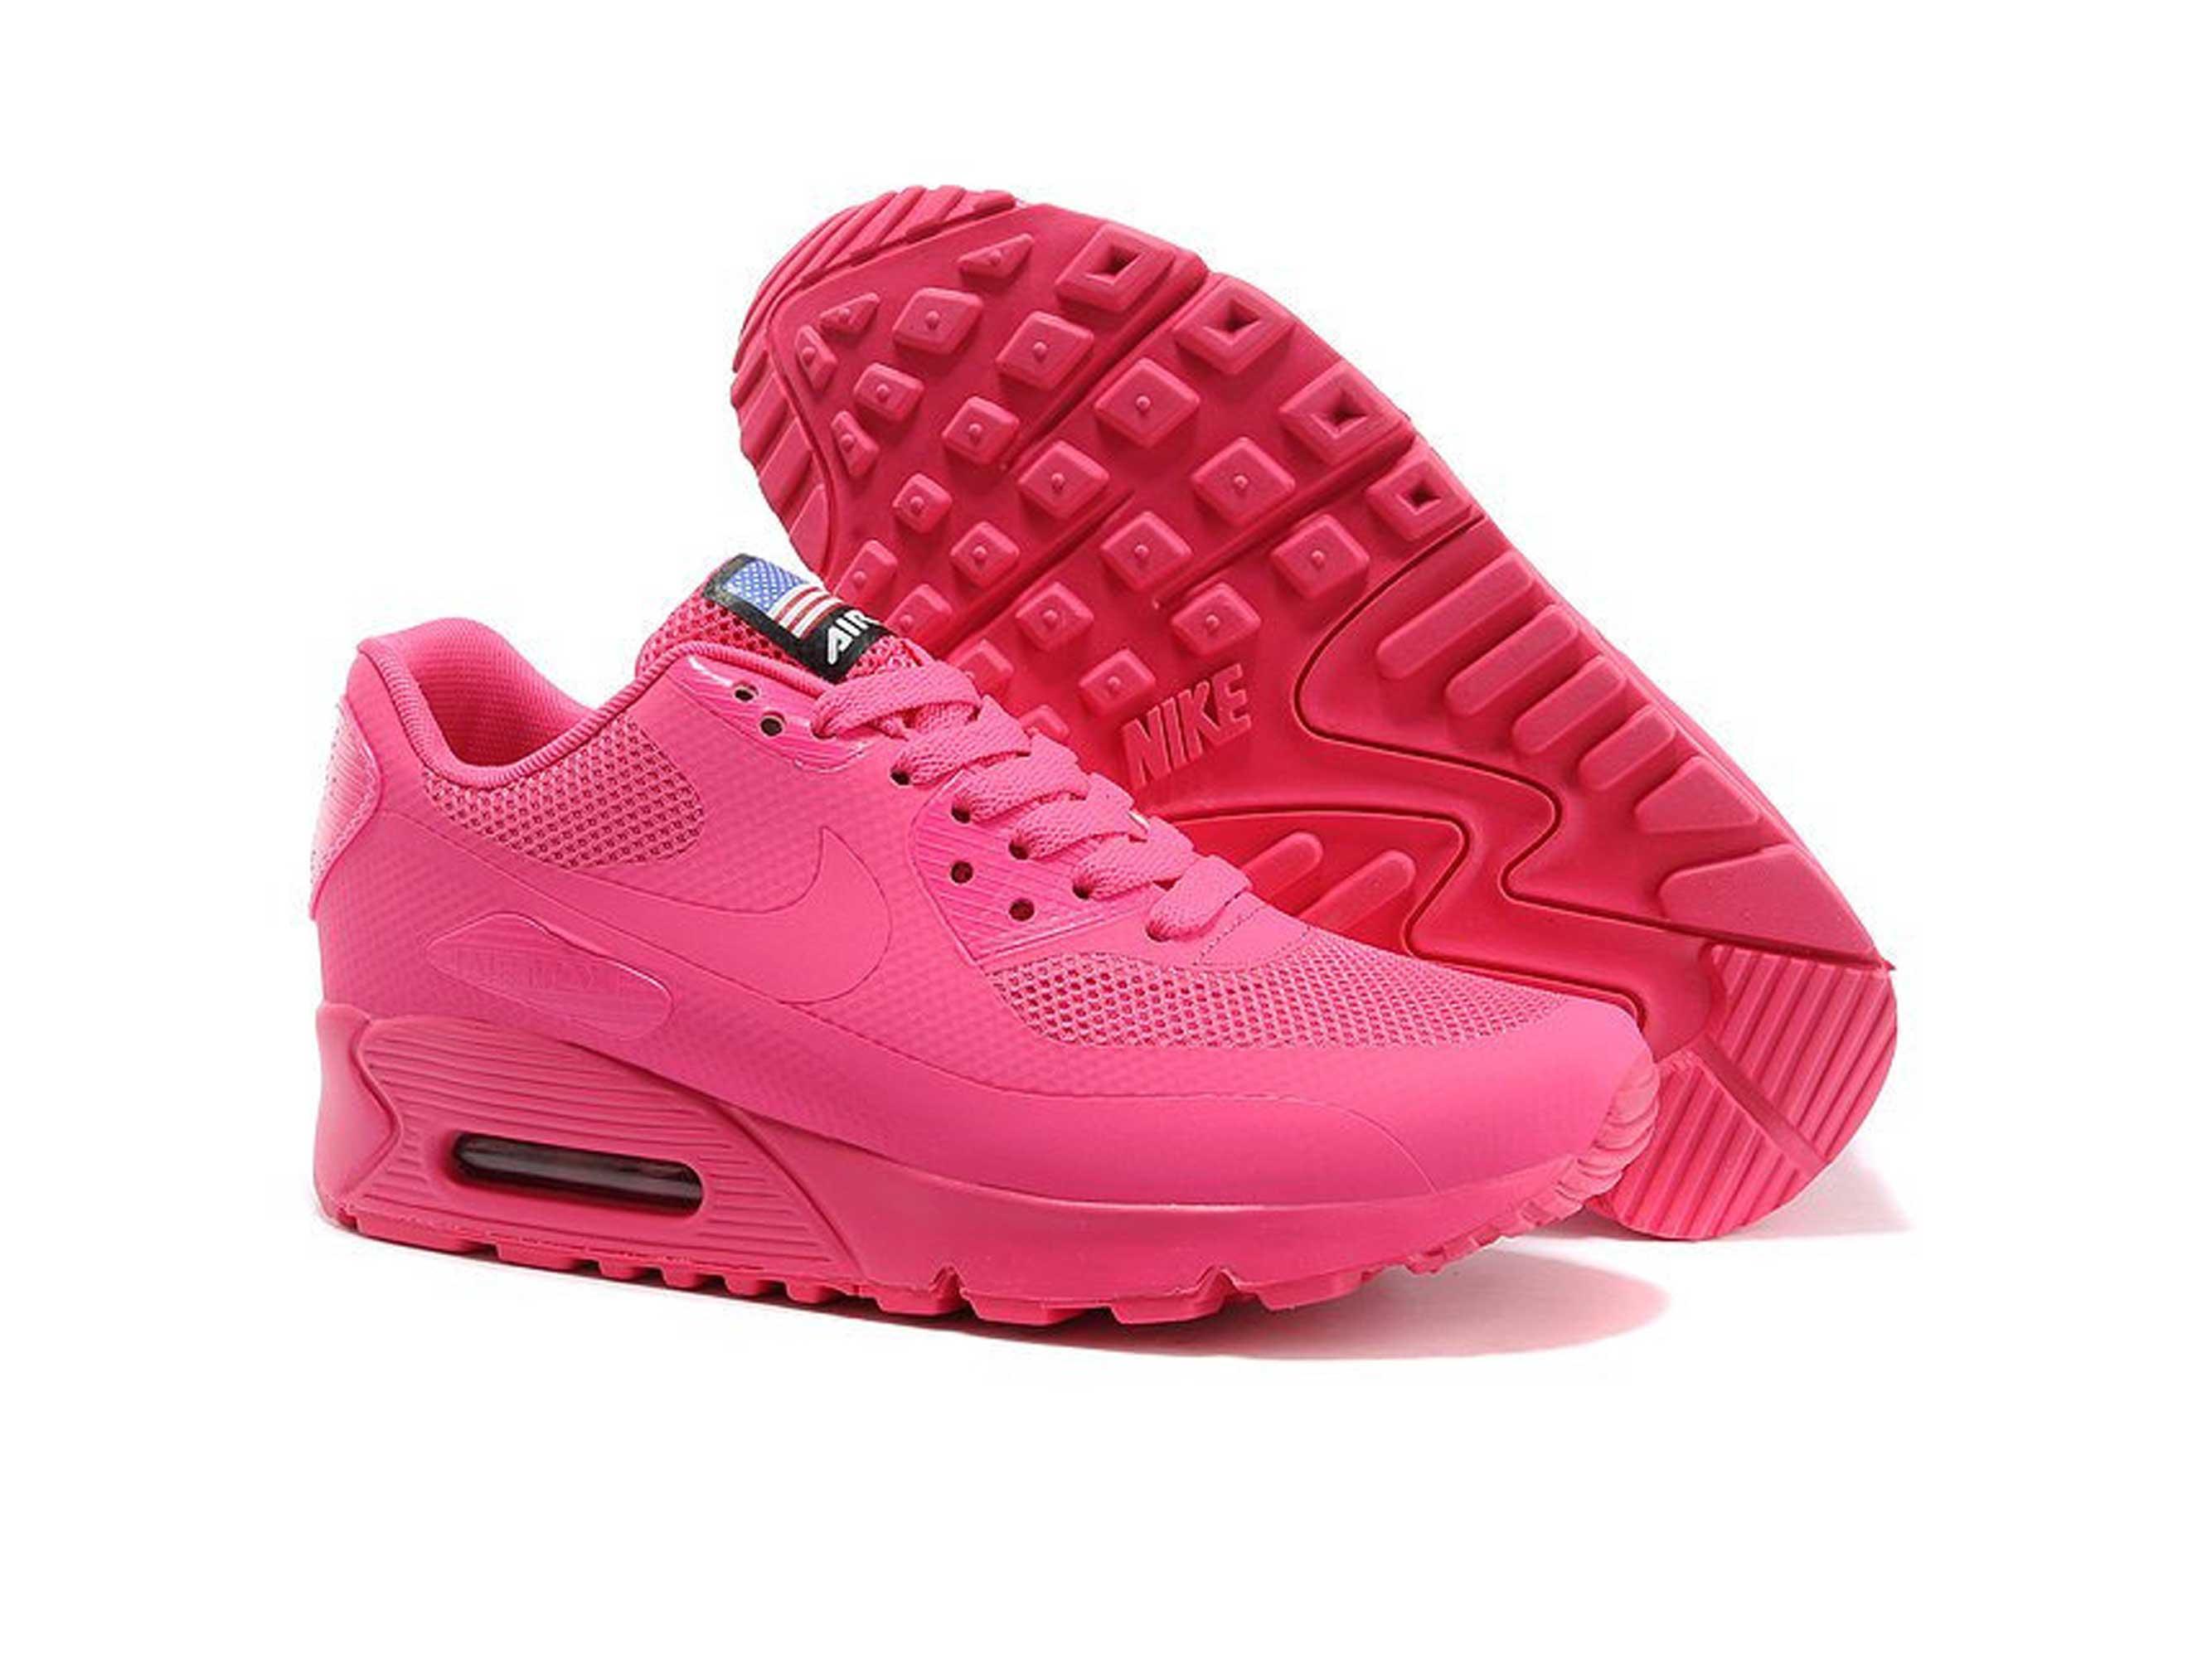 nike air max 90 hyperfuse 2013 pink 613841_222 купить